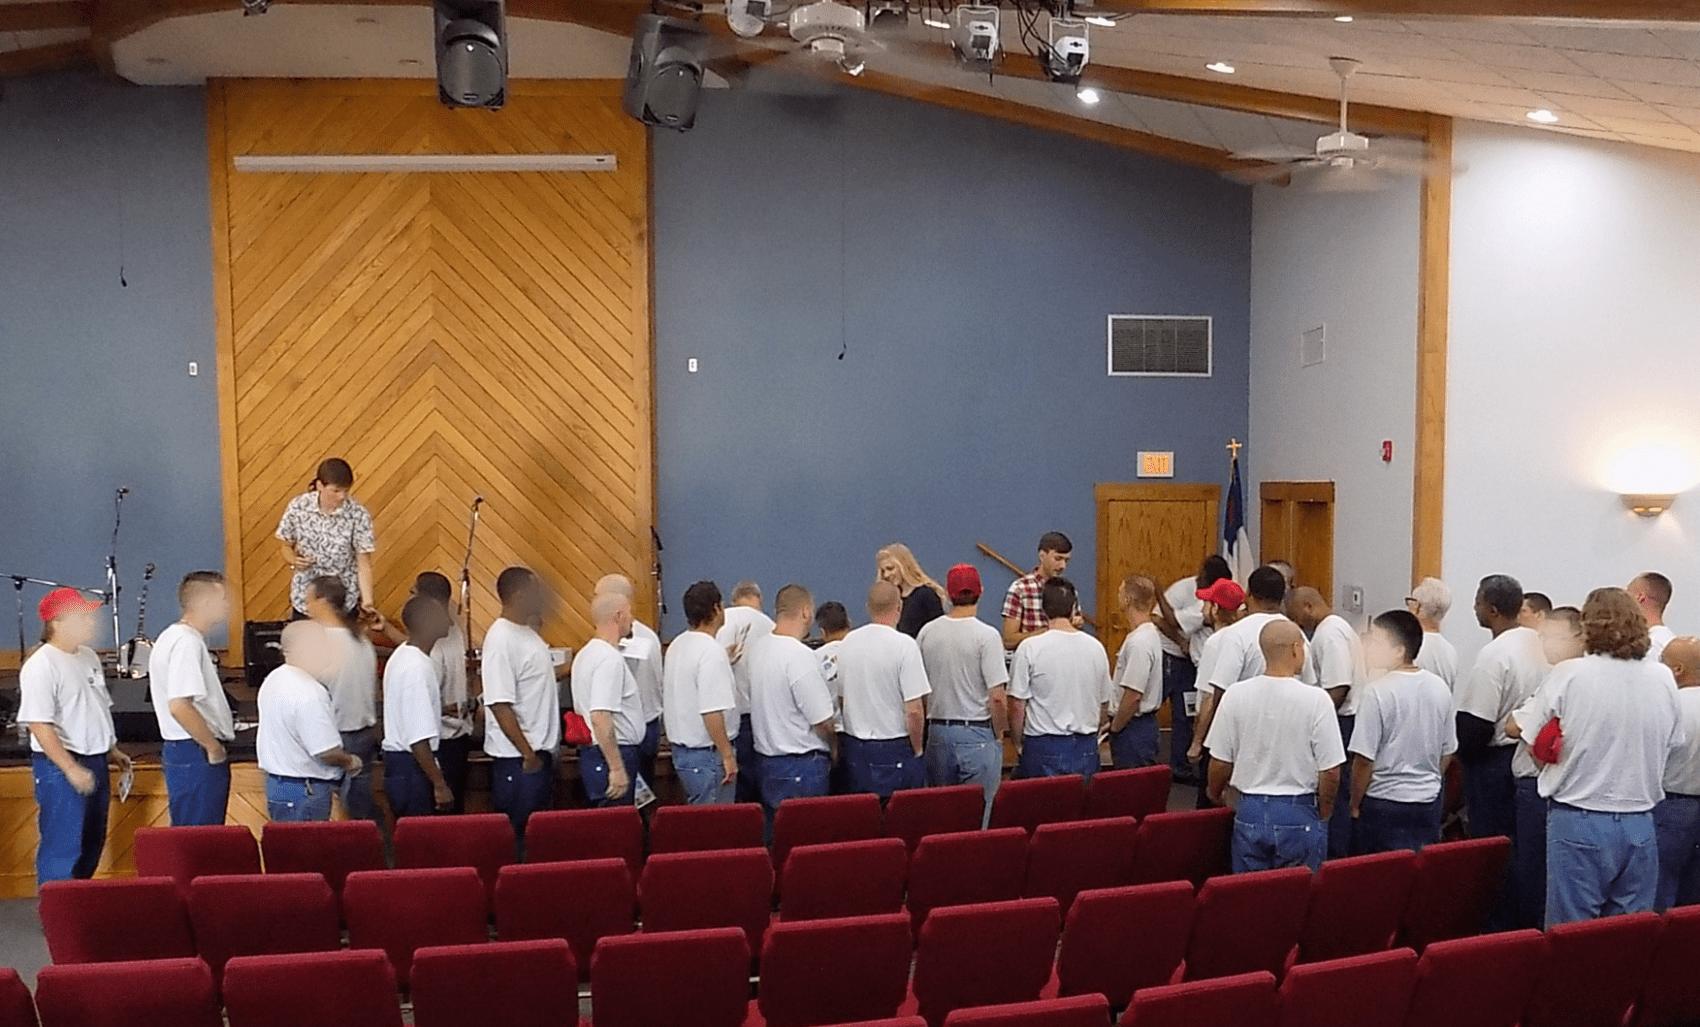 Petersens perform at Ellsworth Correctional Facility